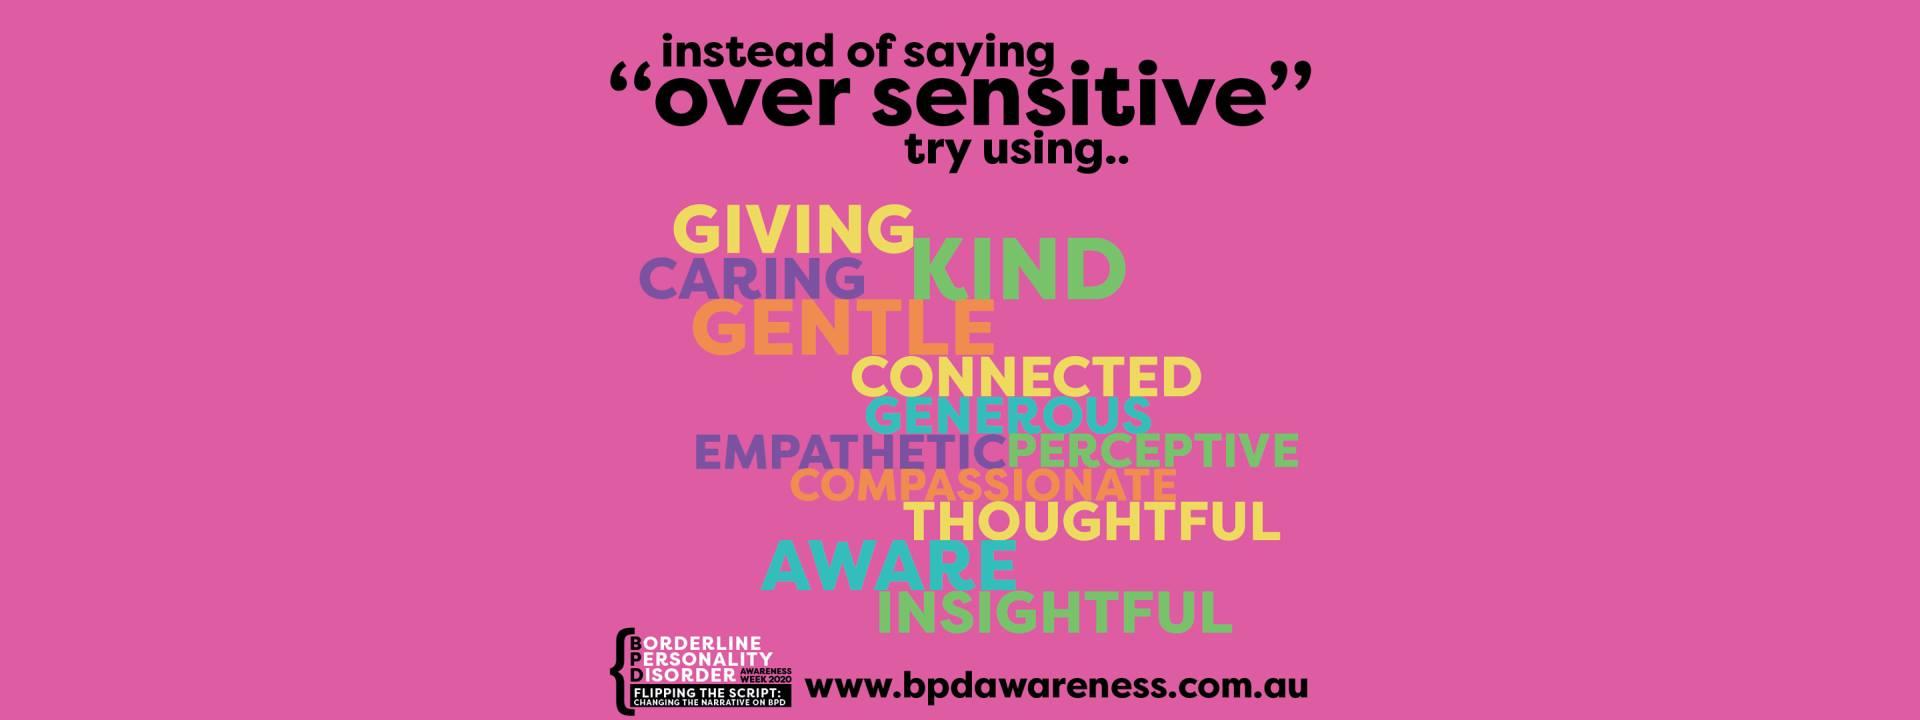 BPD Awareness Week 2020 - Not Over Sensitive